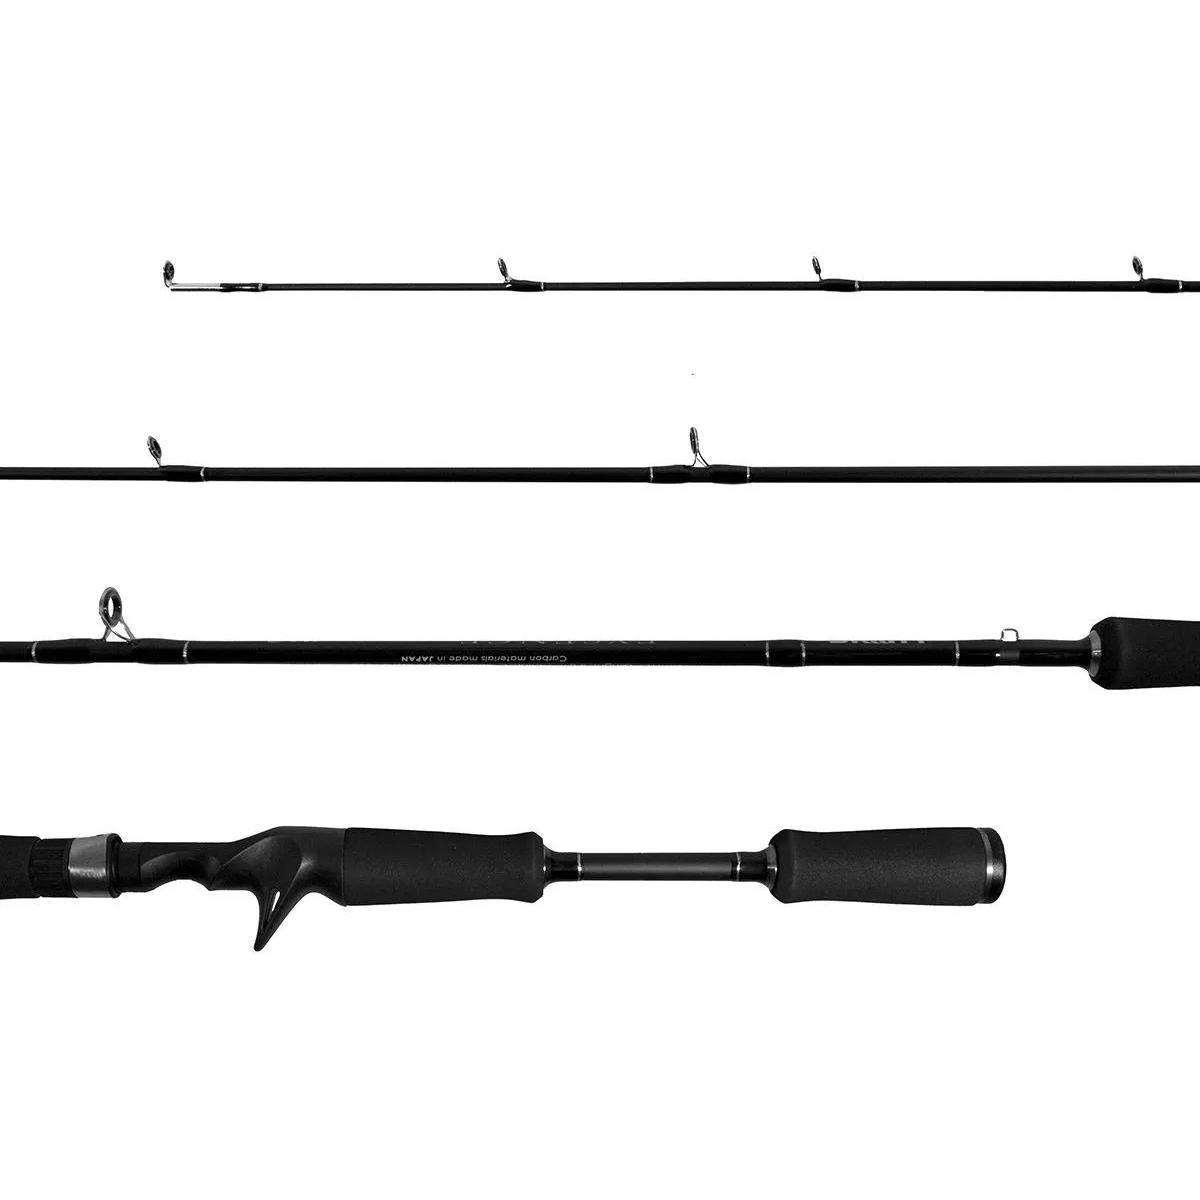 Vara Lumis Exsence 601 1,83m 10-25lb P/ Carretilha Inteiriça  - Pesca Adventure